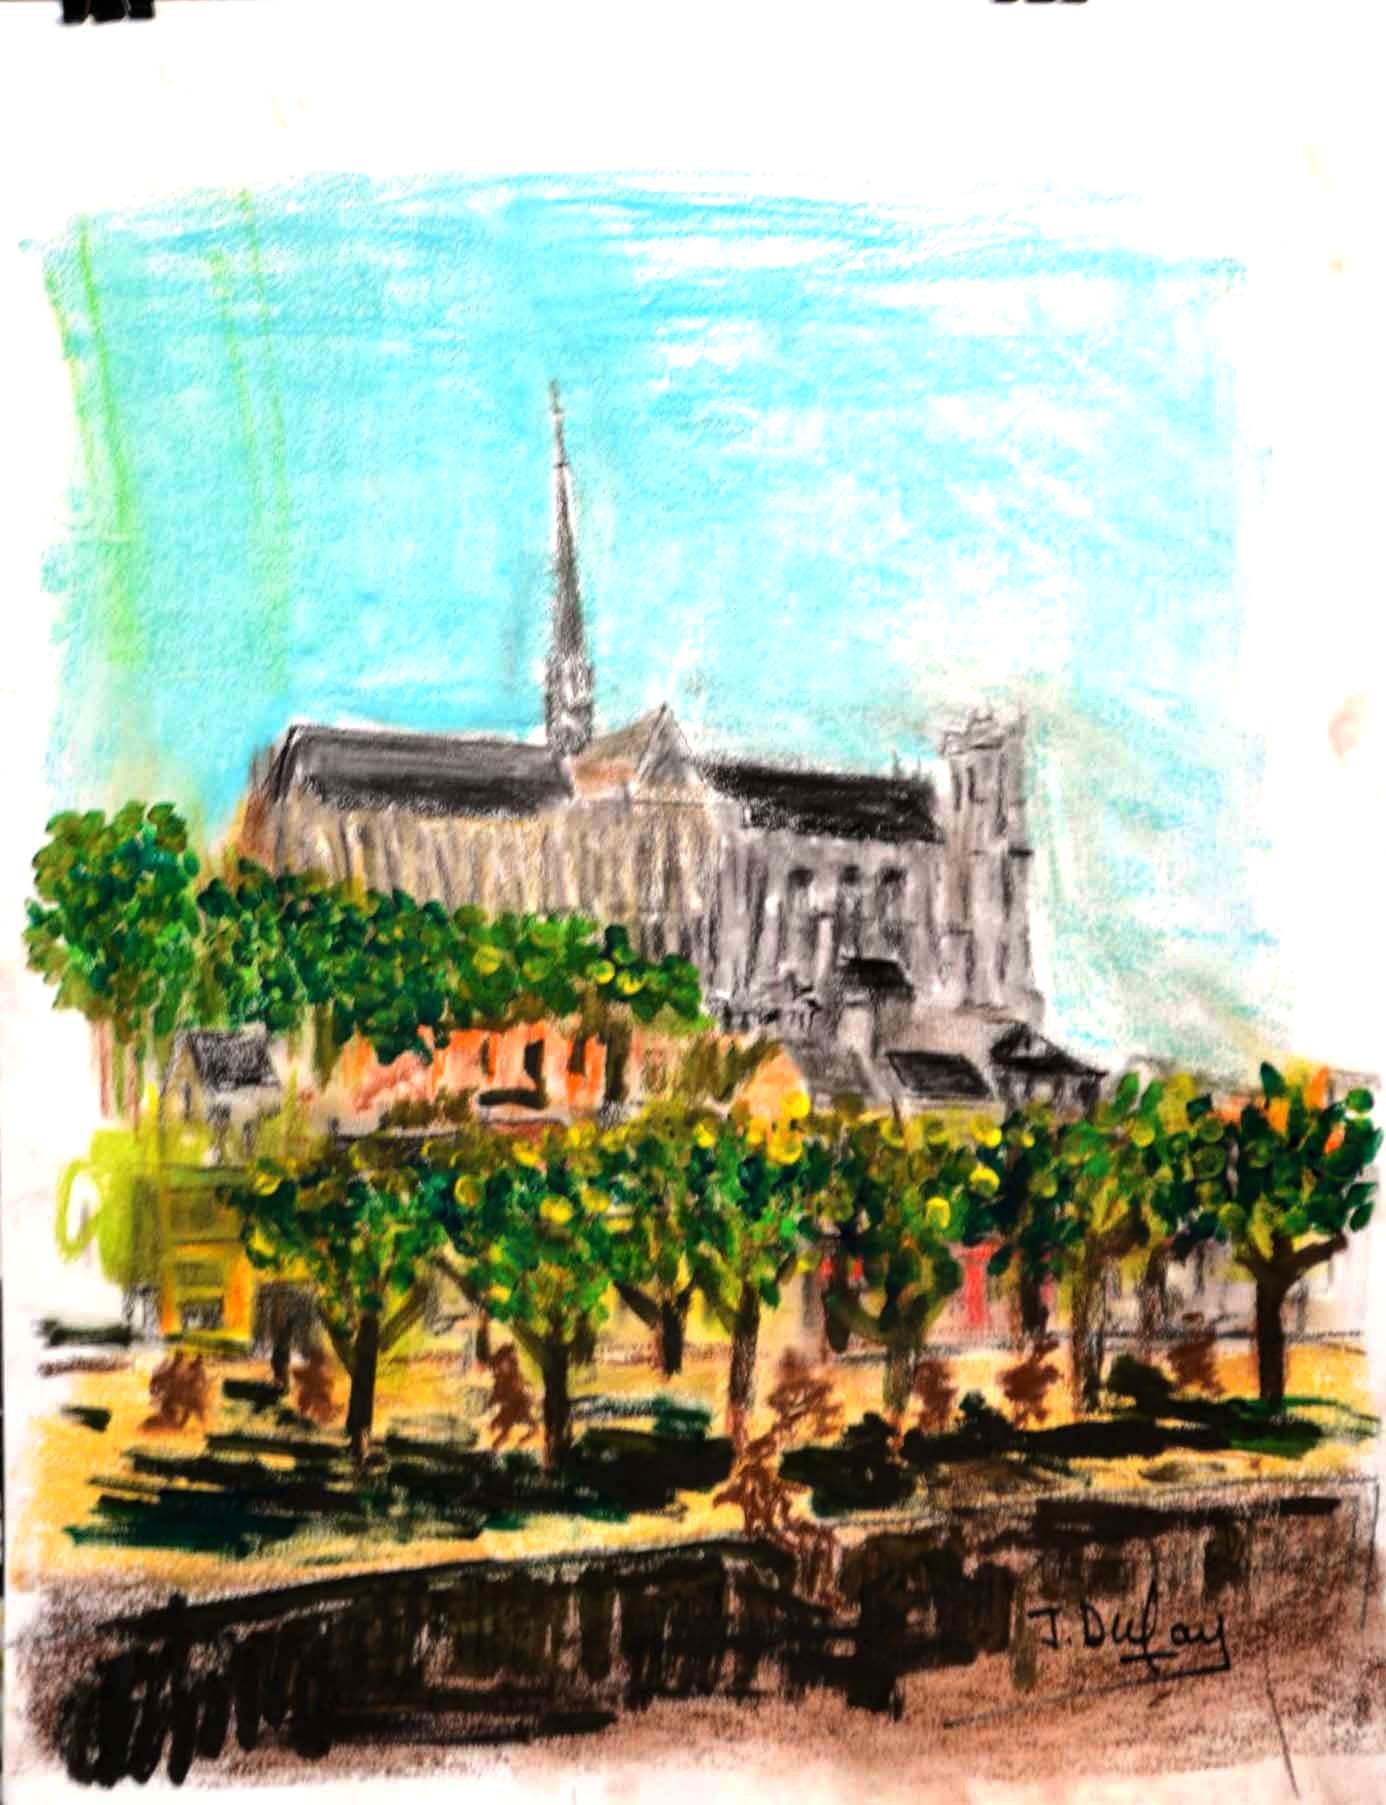 Jérôme Dufay - place-parmentier-cathedrale-amiens.jpg